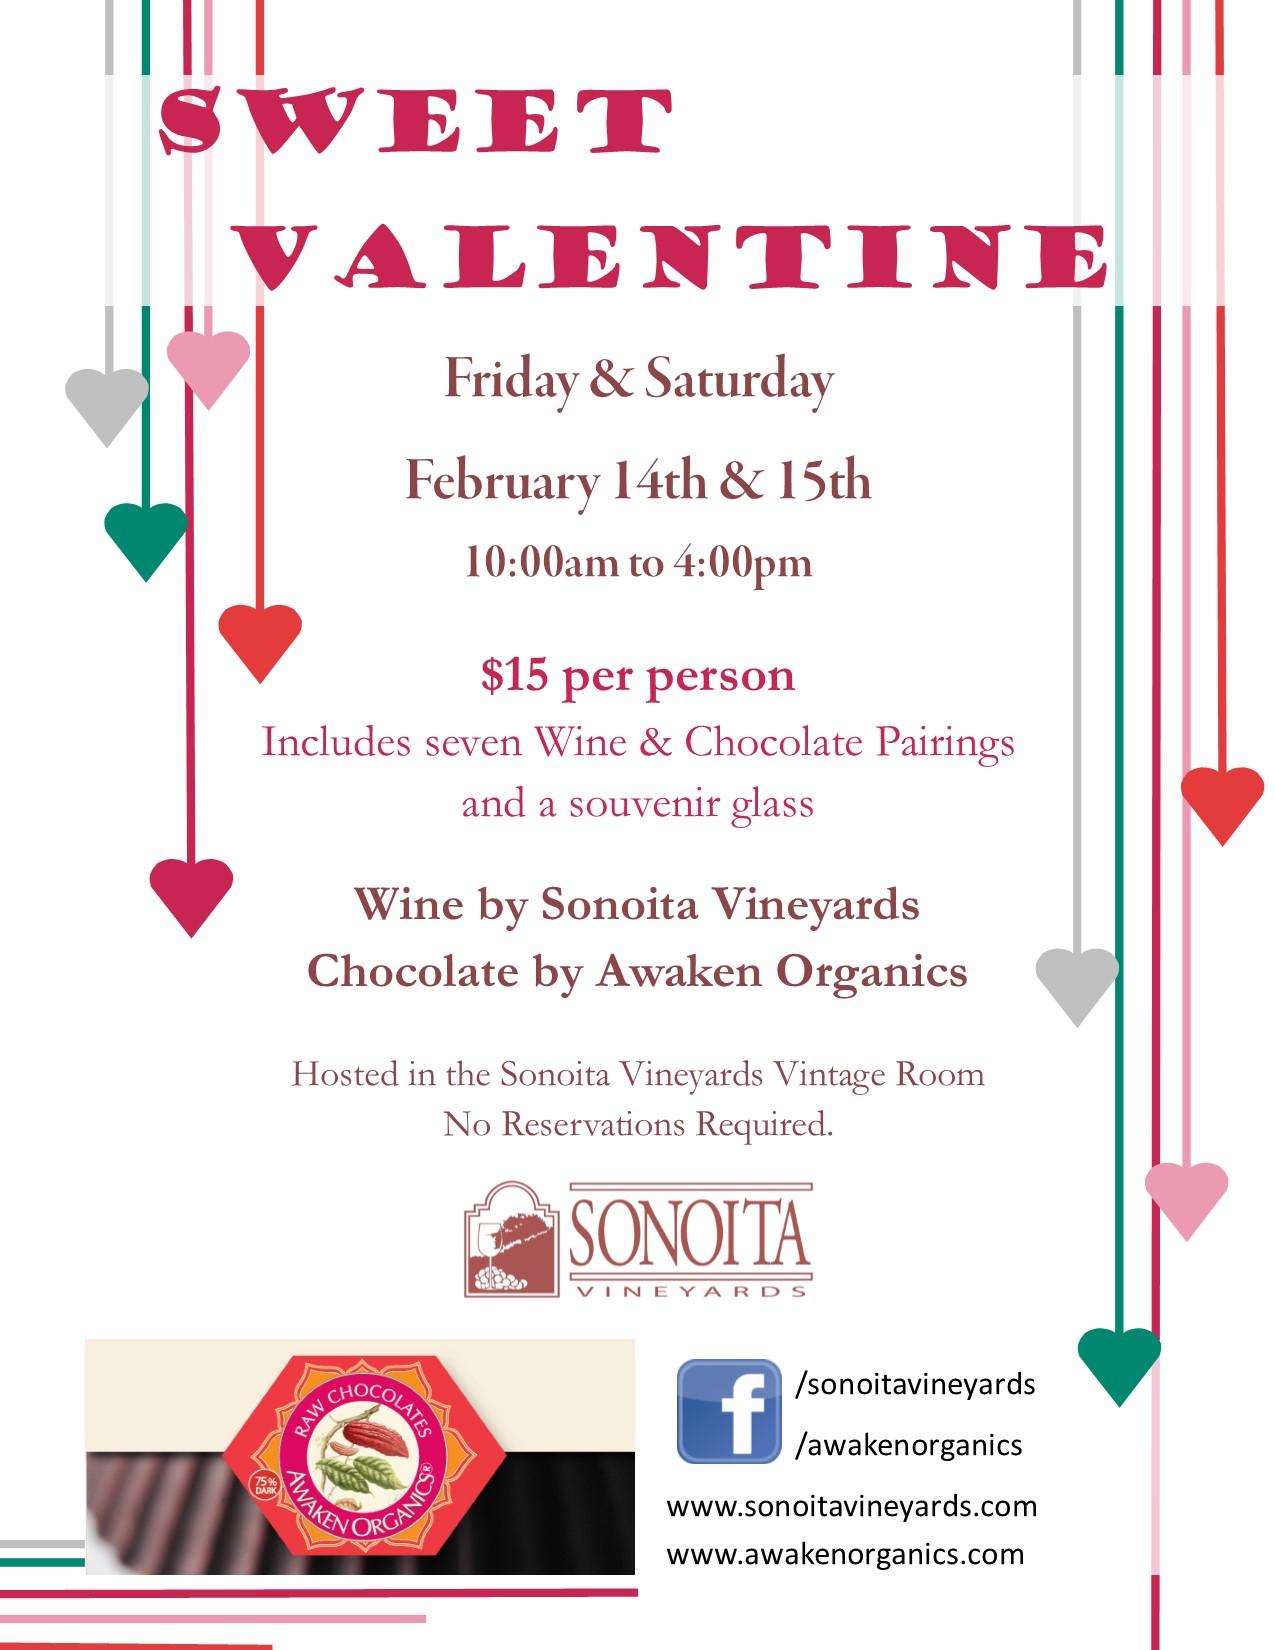 Sweet Valentine 2014